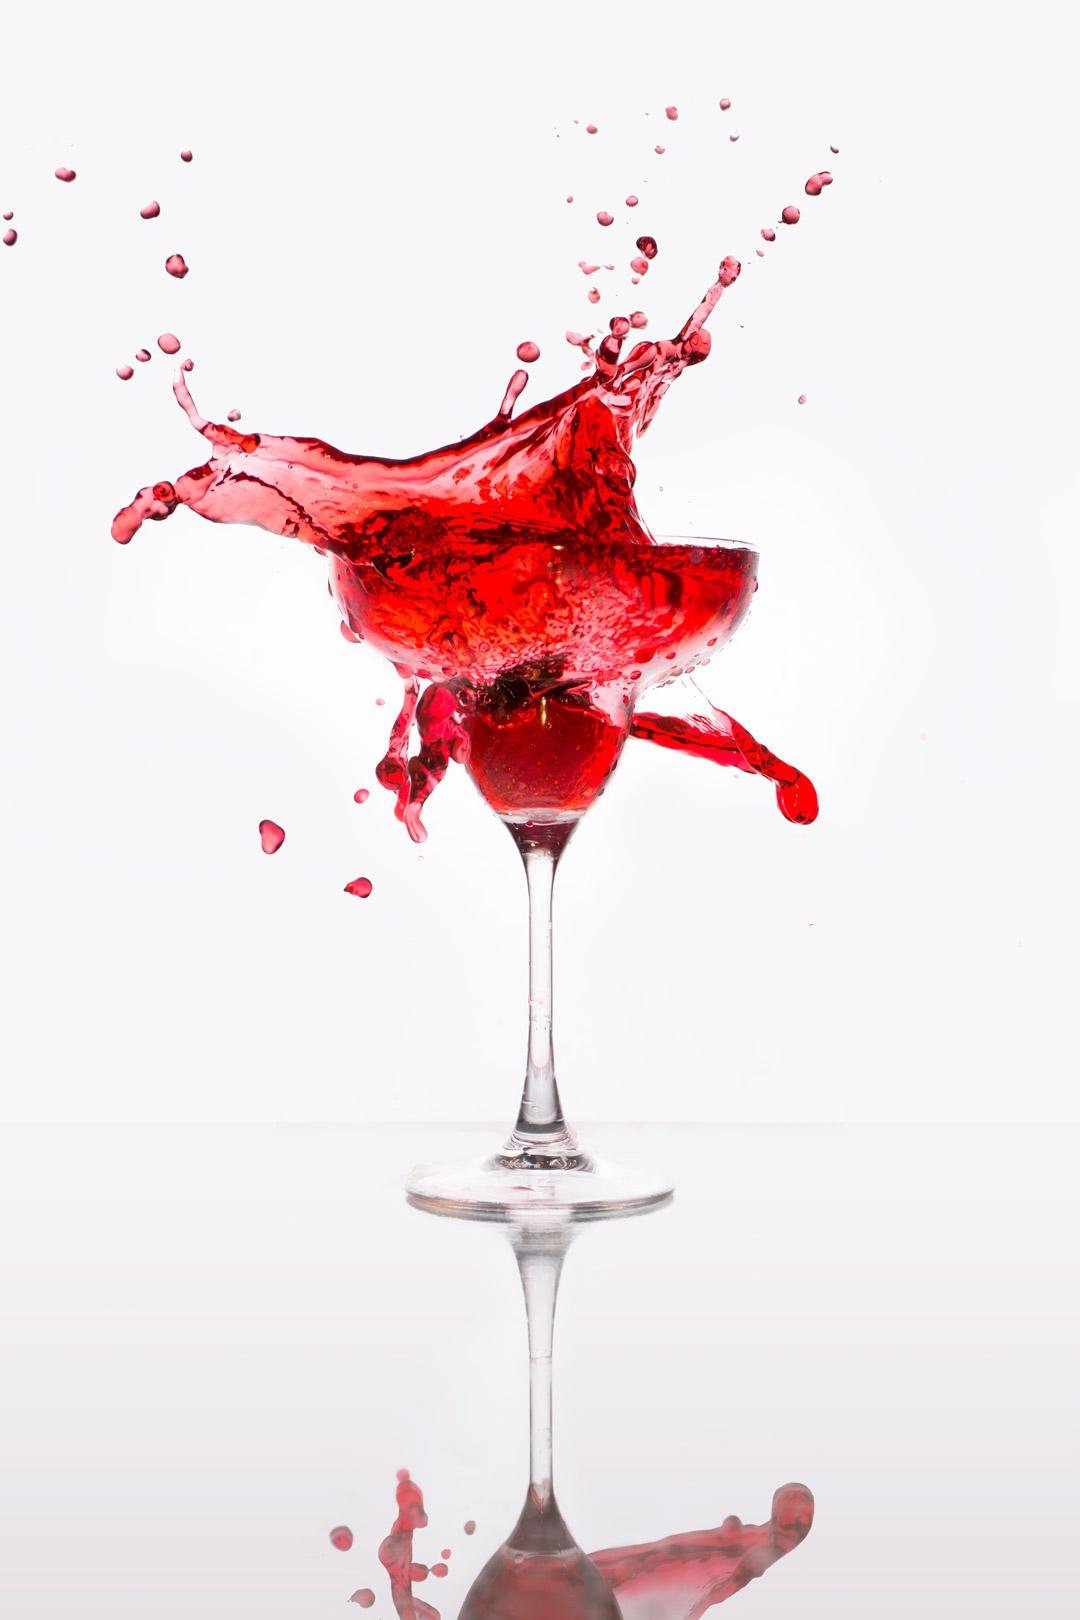 Daiquiri Splash Beverage Photography